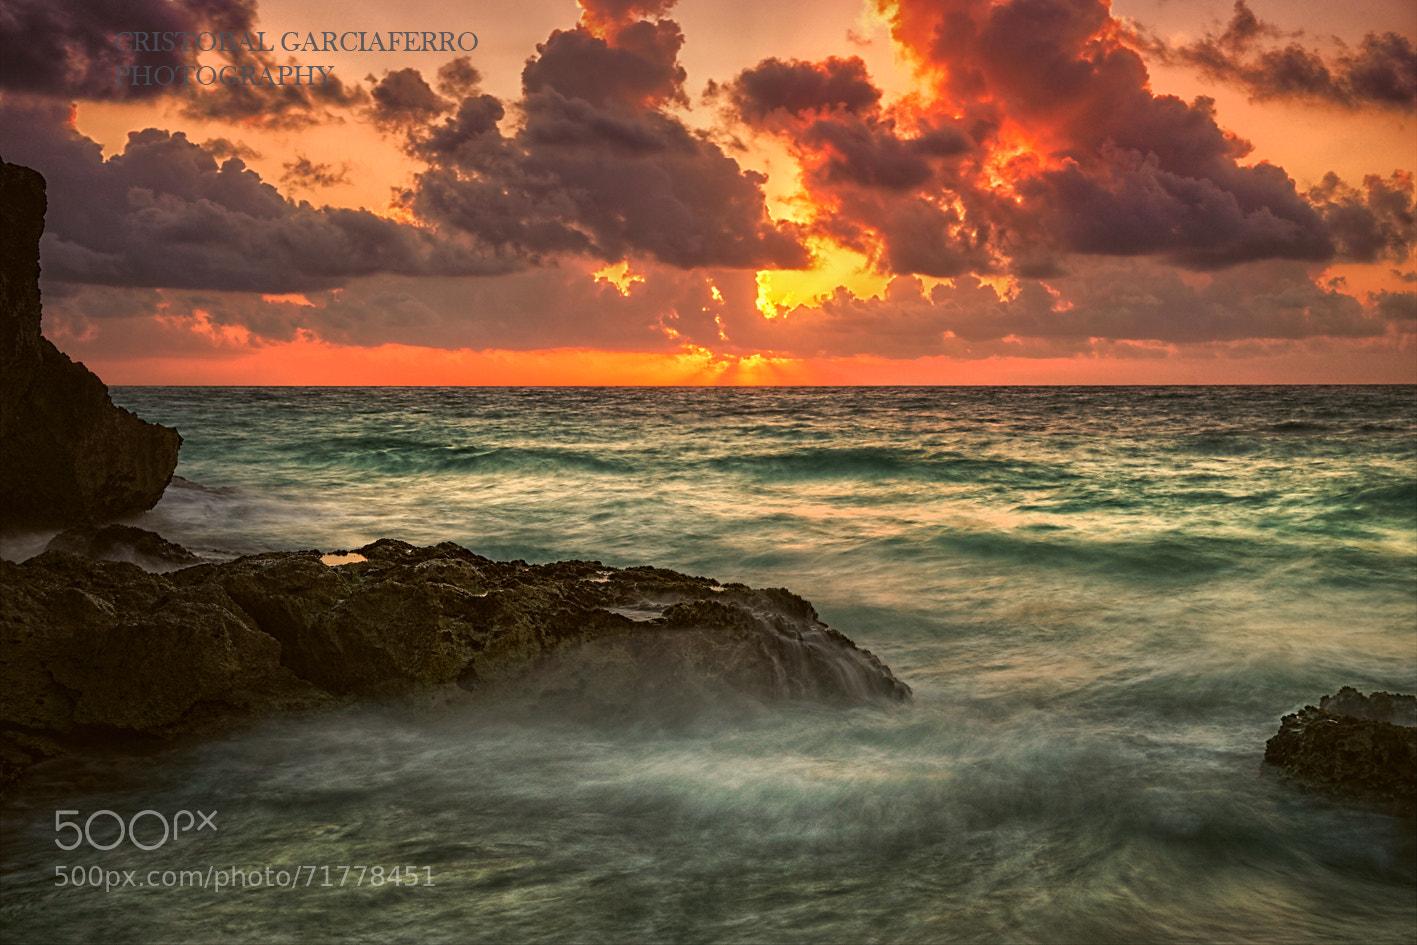 Photograph Sunrise at Tulum Beach by Cristobal Garciaferro Rubio on 500px